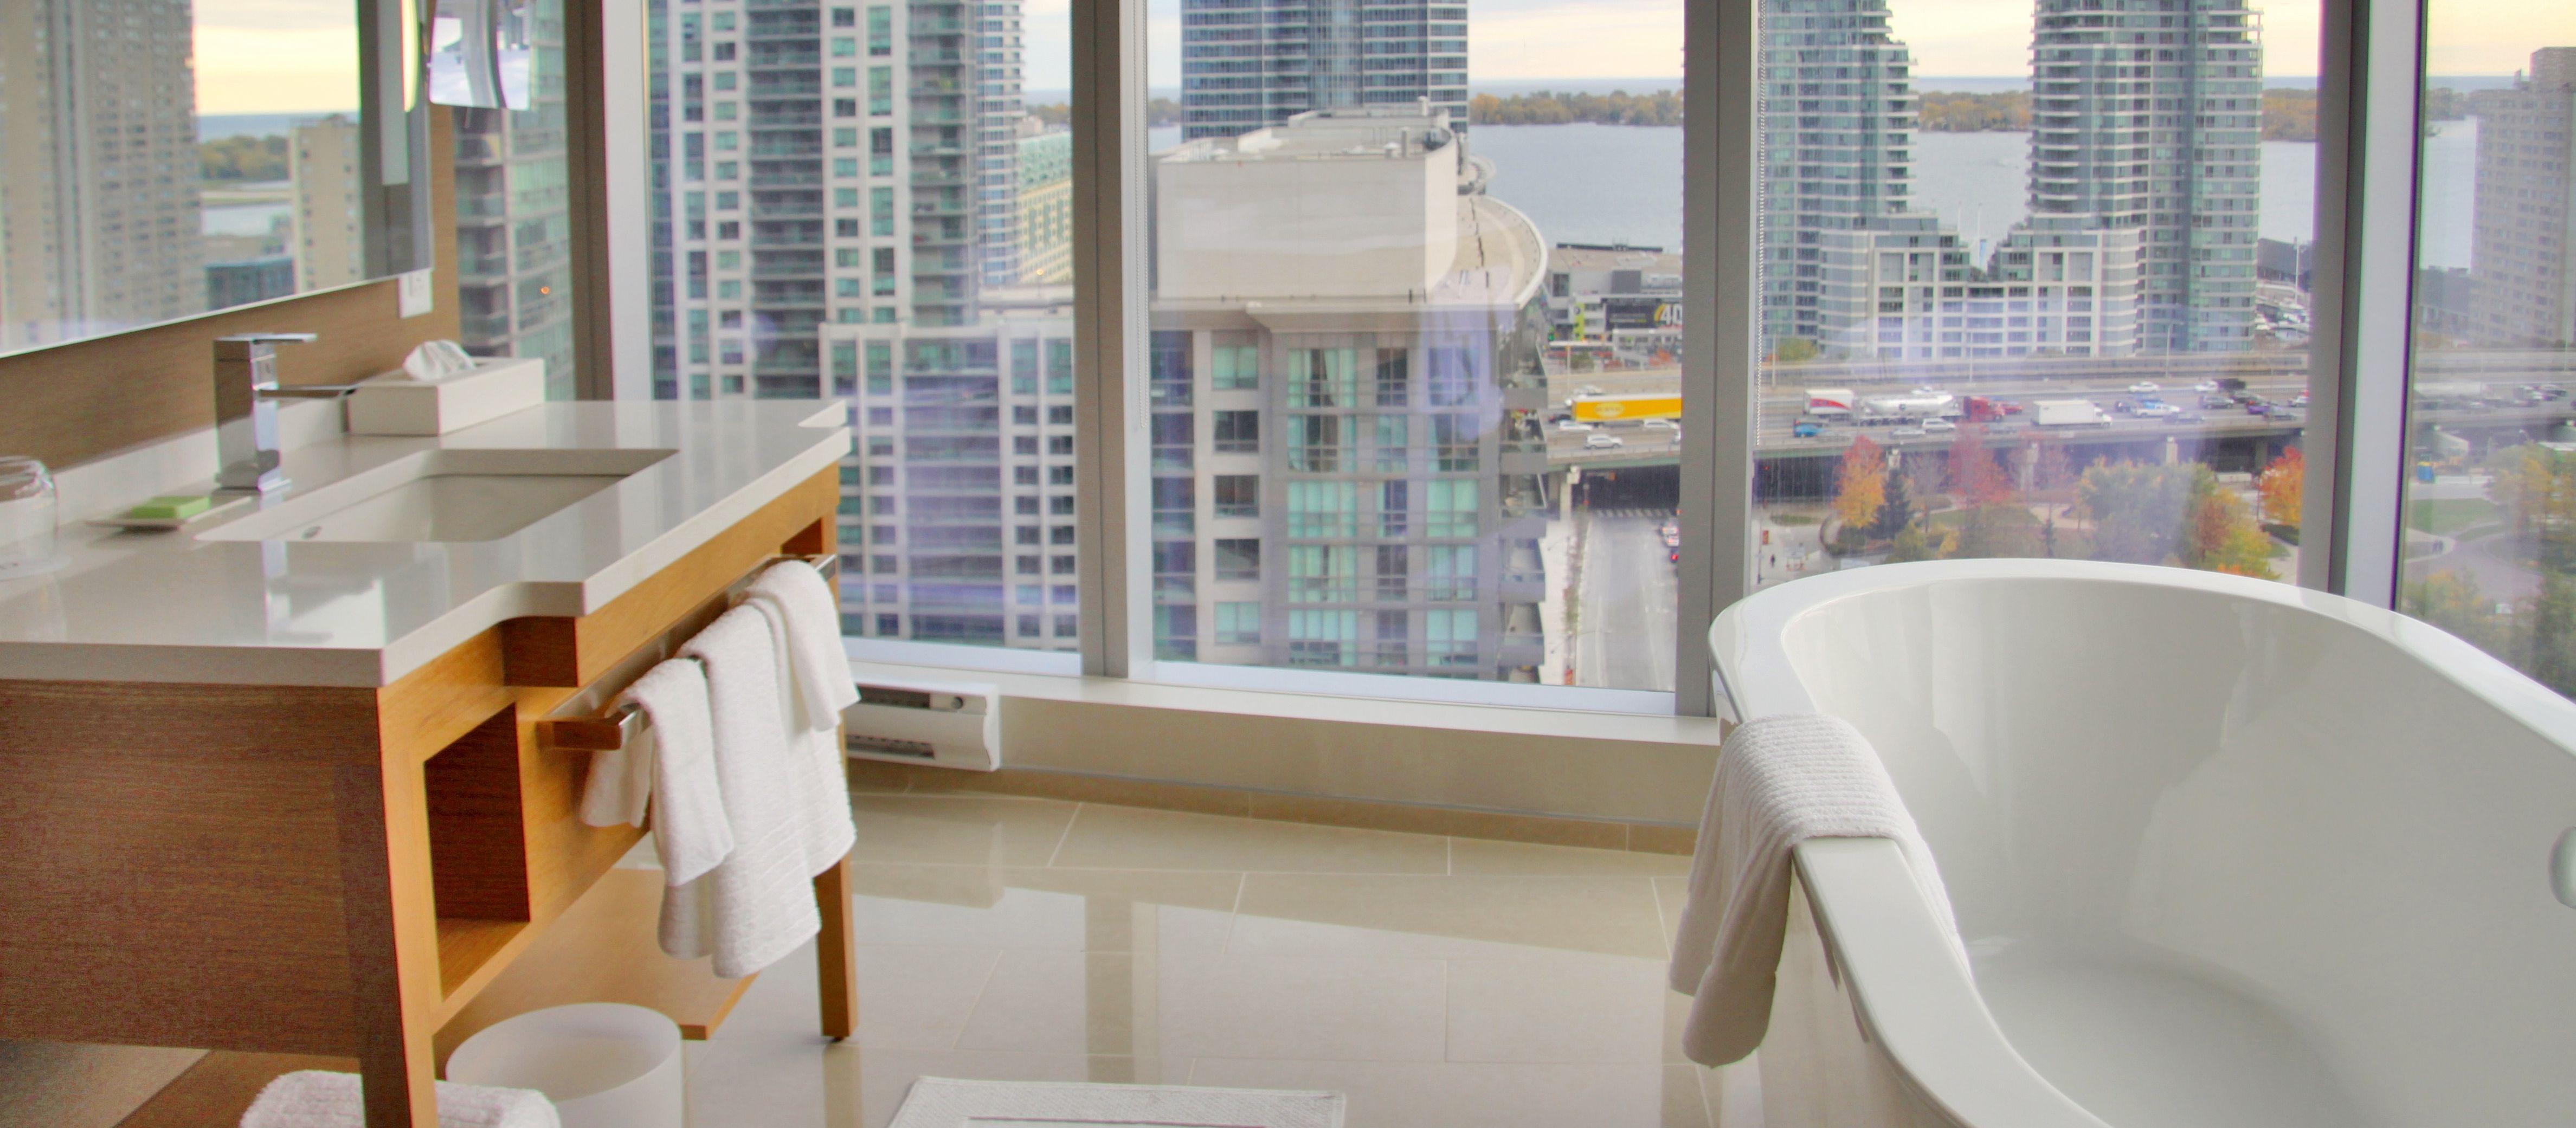 Corner Room im Delta Hotel Toronto